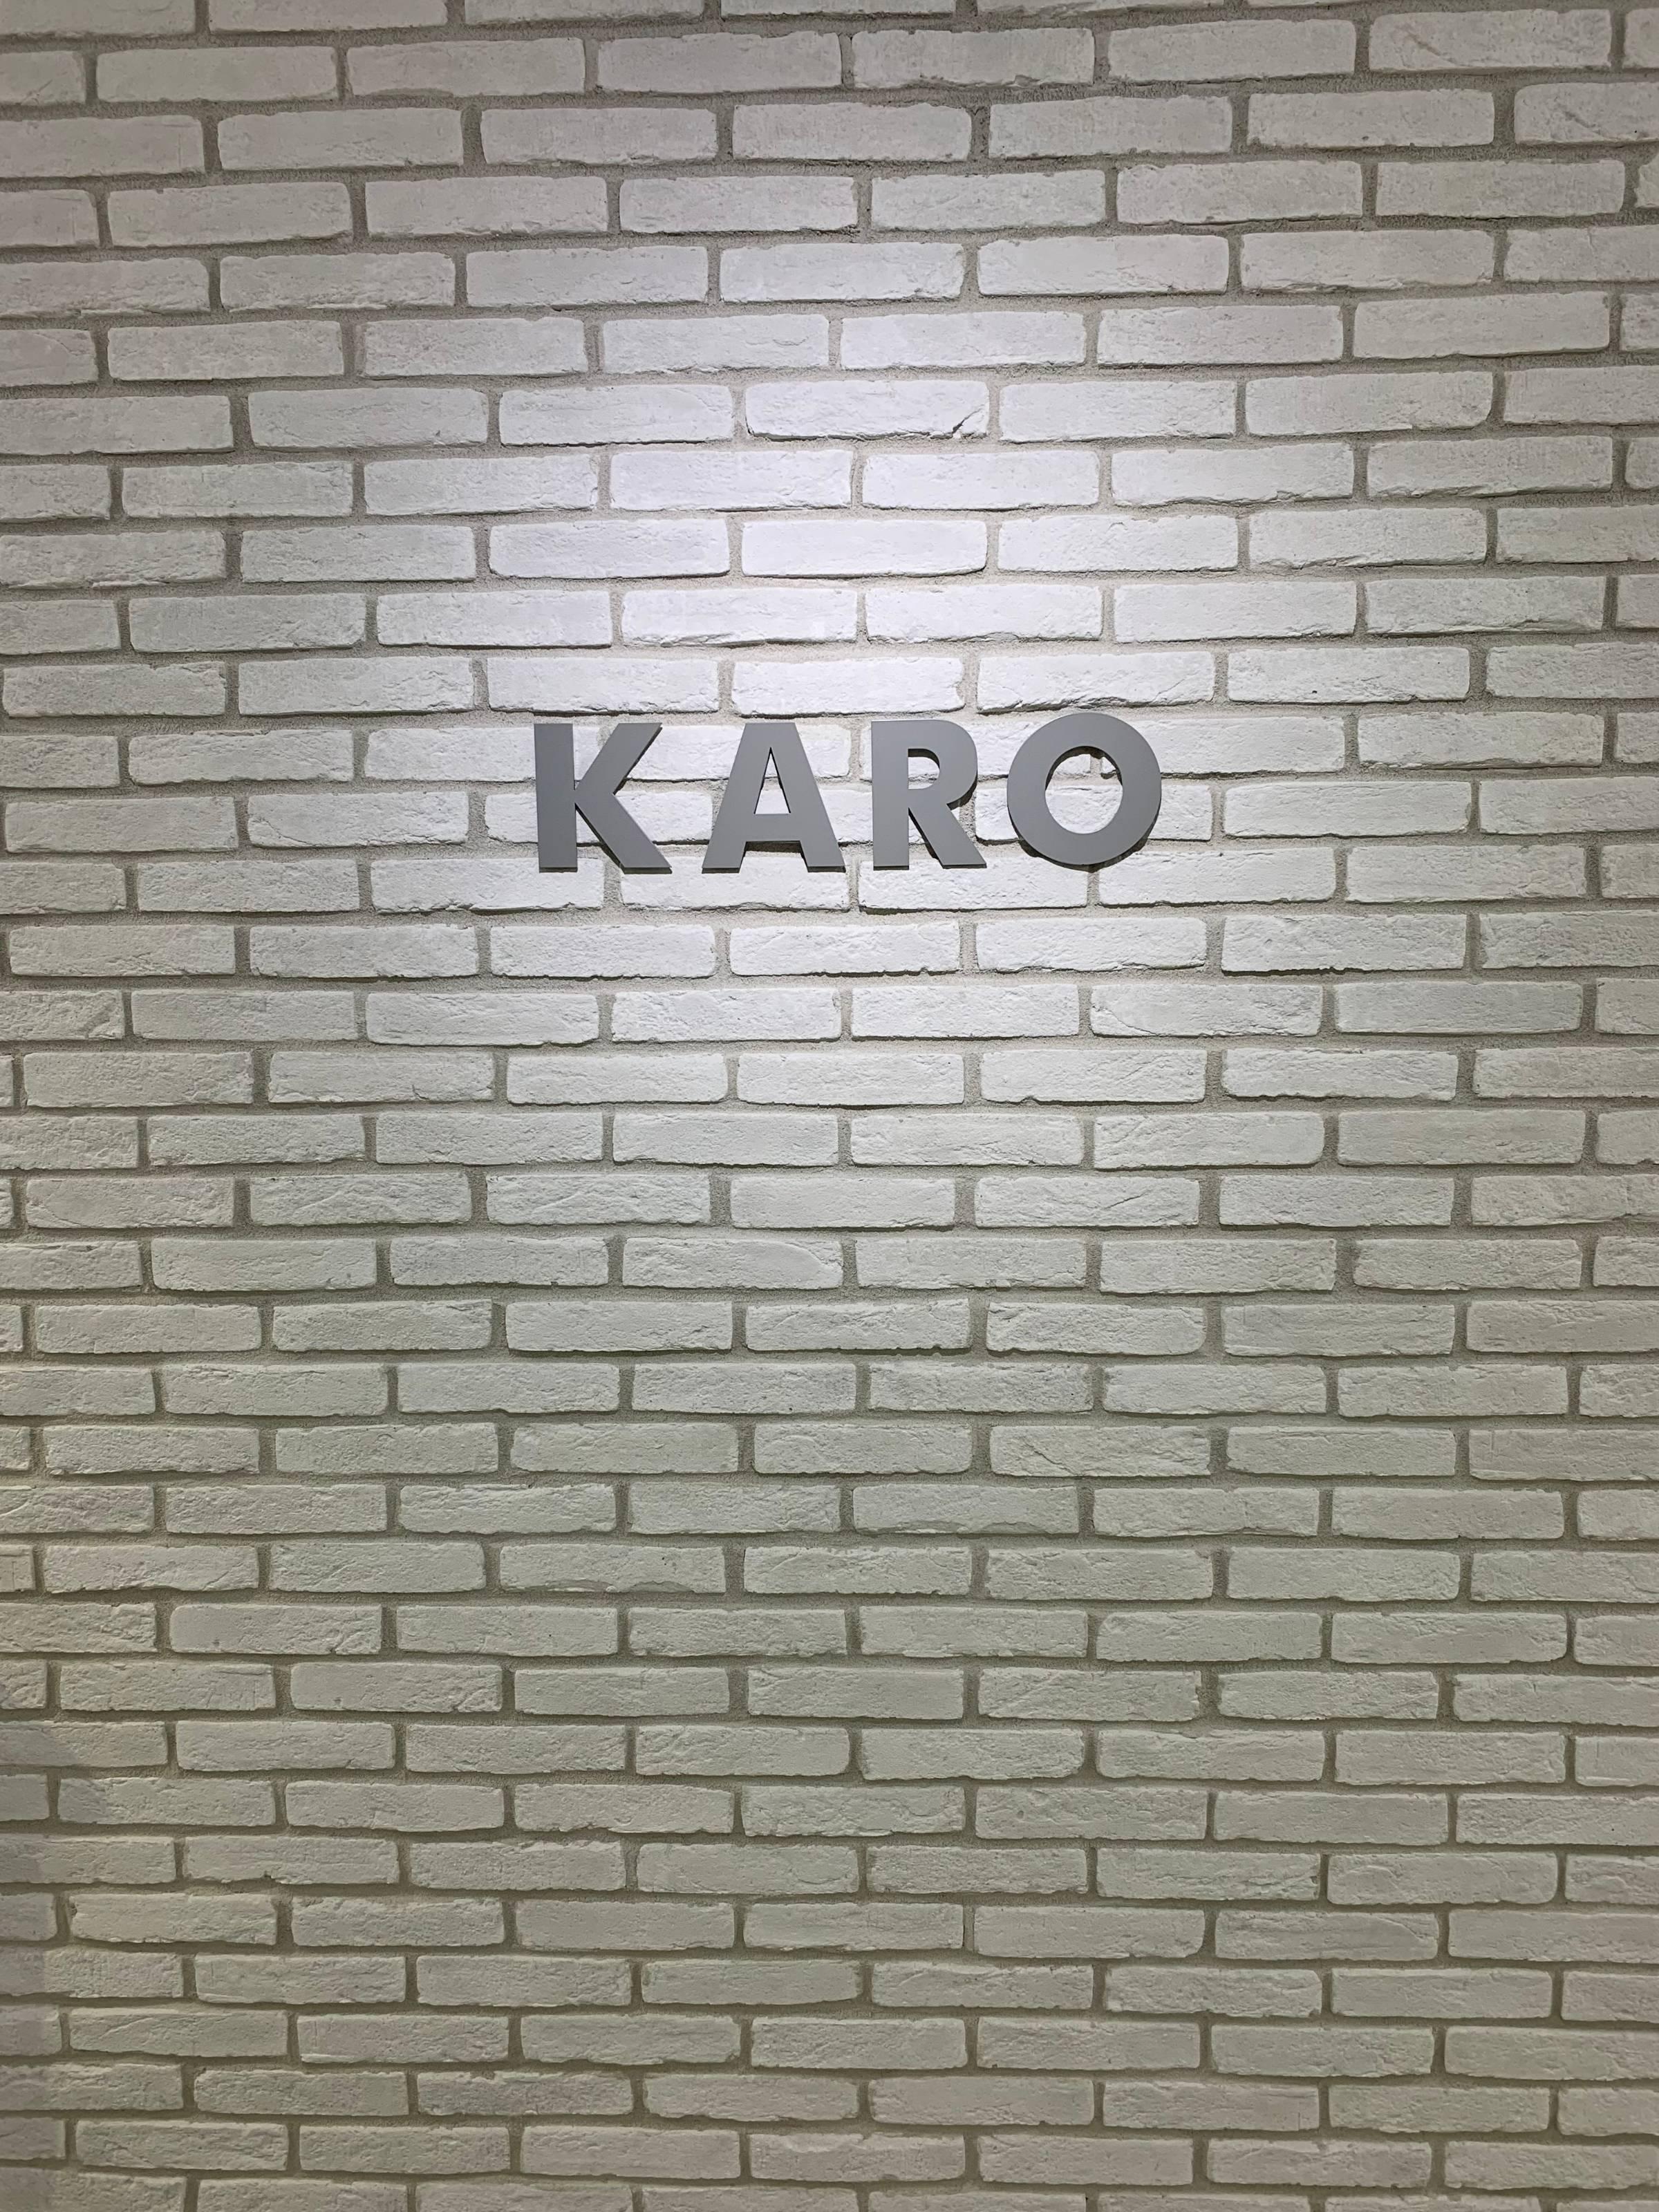 株式会社カロ 大阪本社